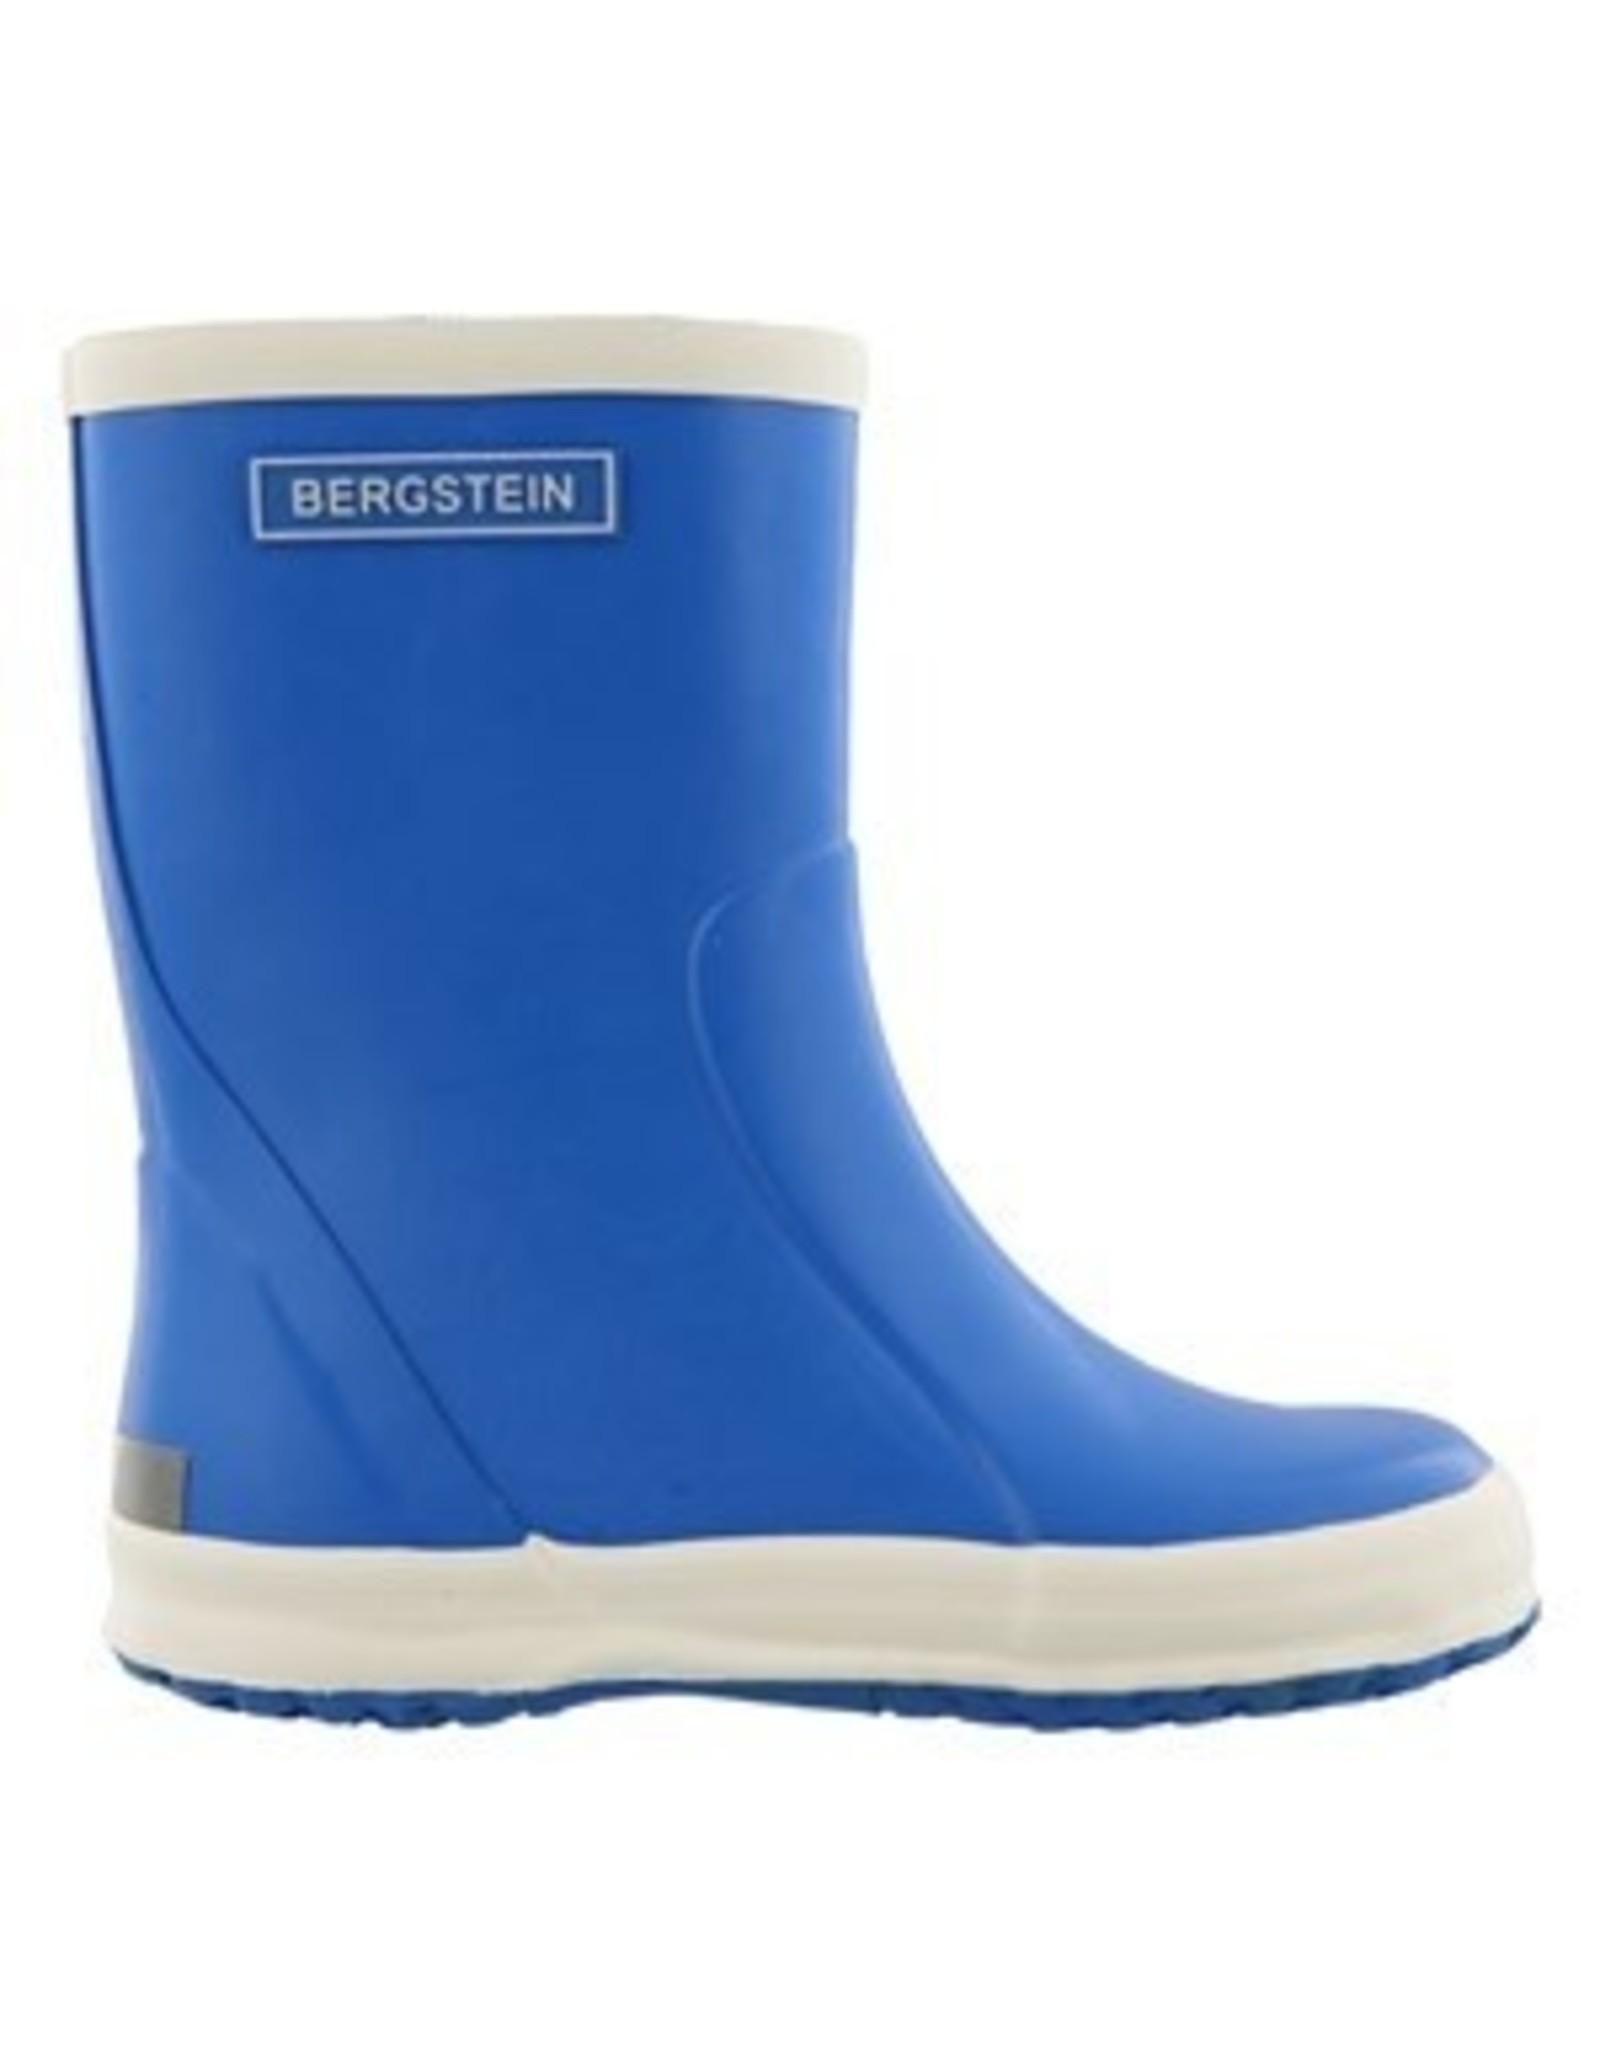 Bergstein Rain boot Cobalt